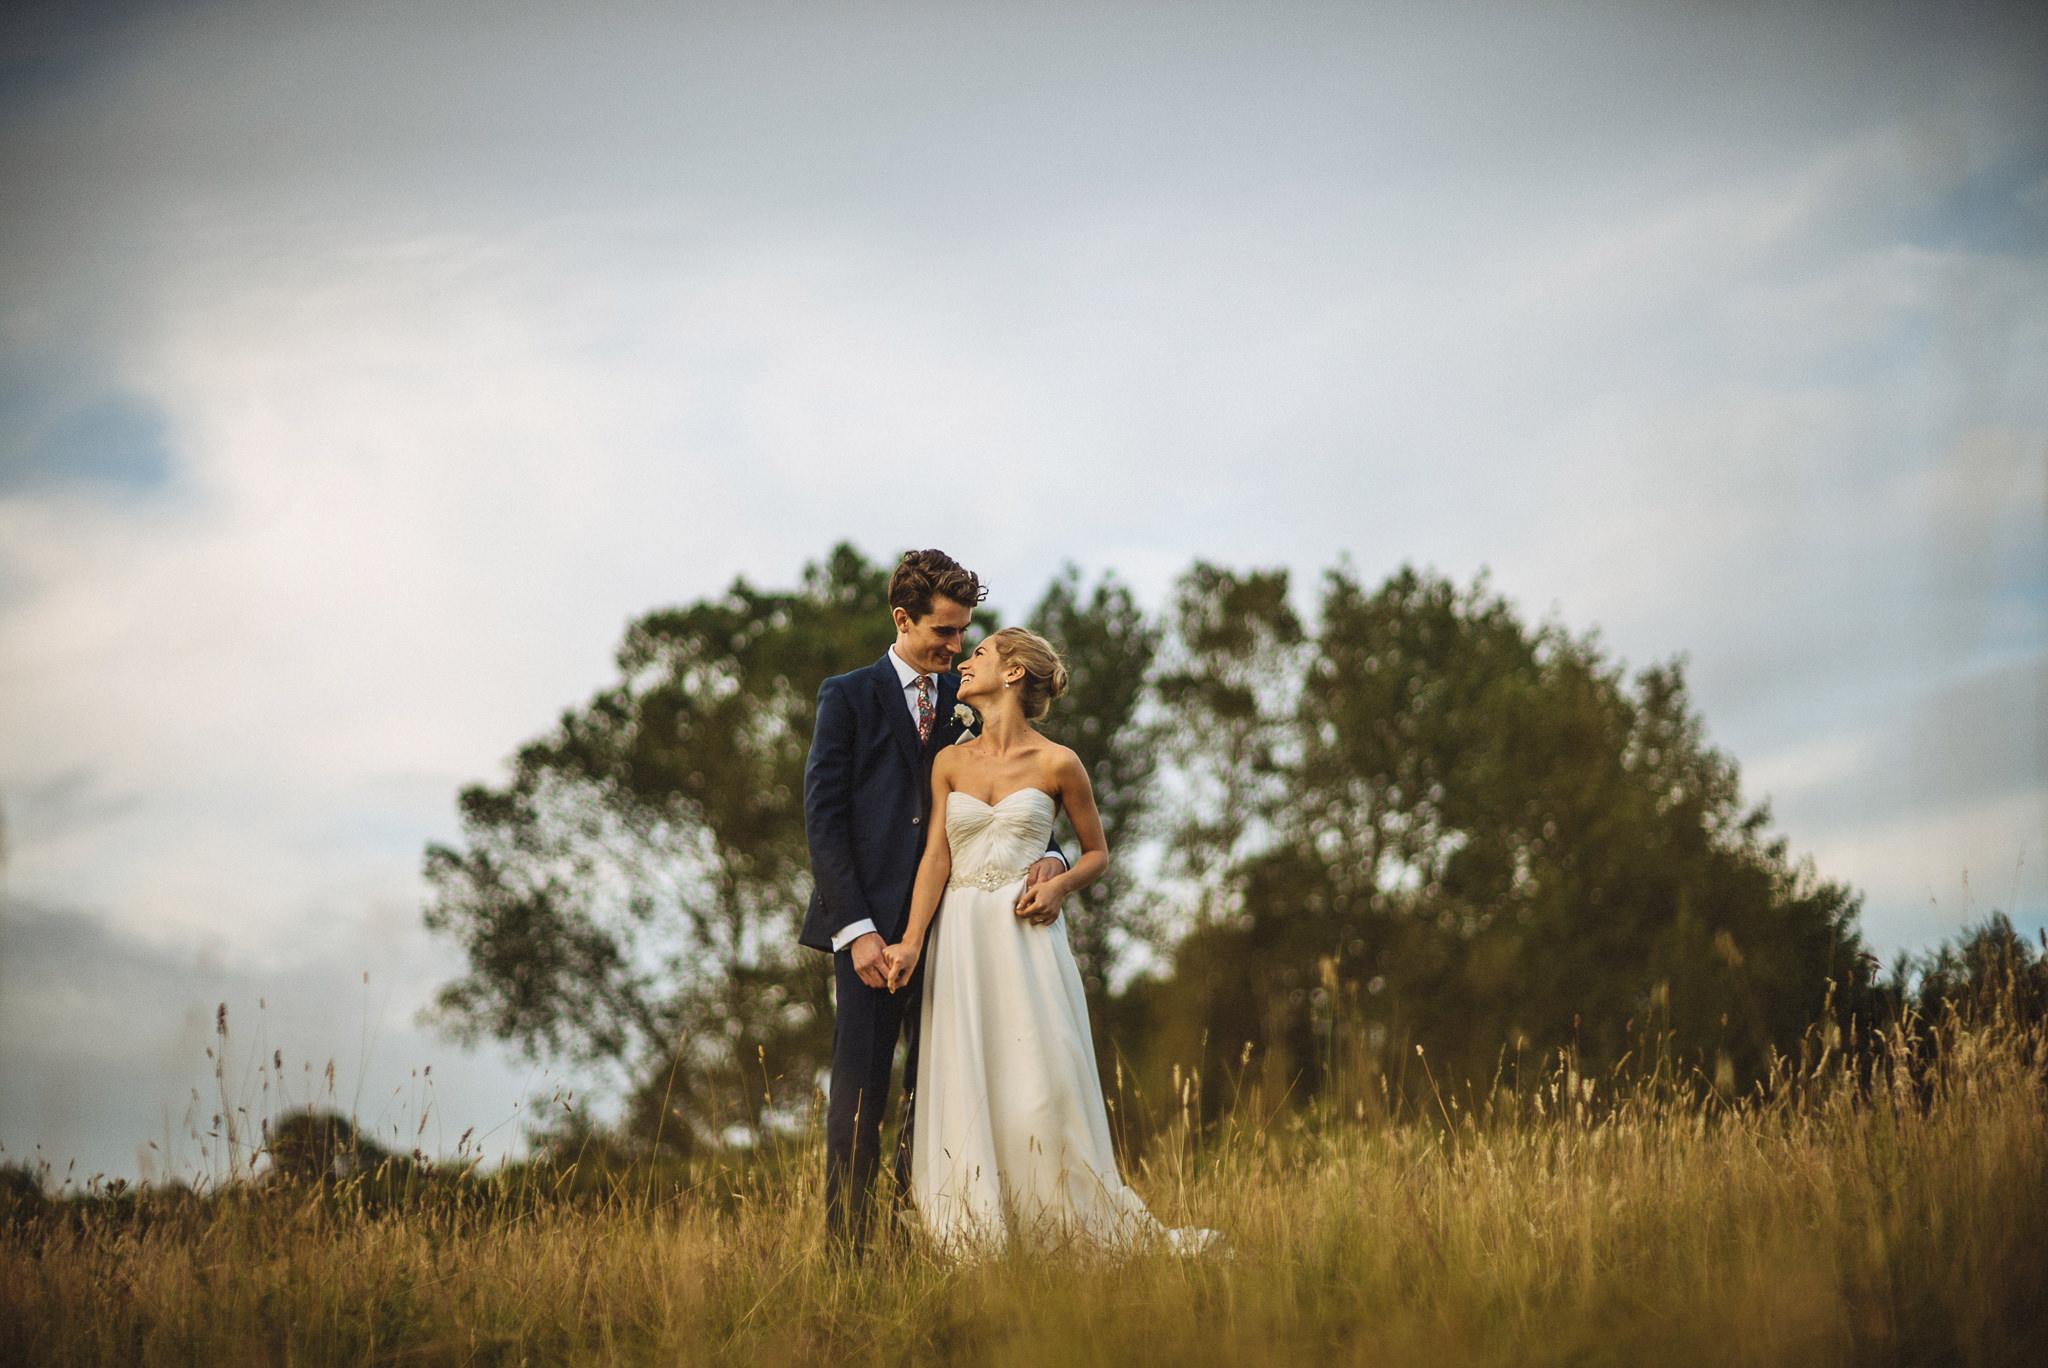 paul-marbrook-Gaynes-Park Wedding-Photographer-90132